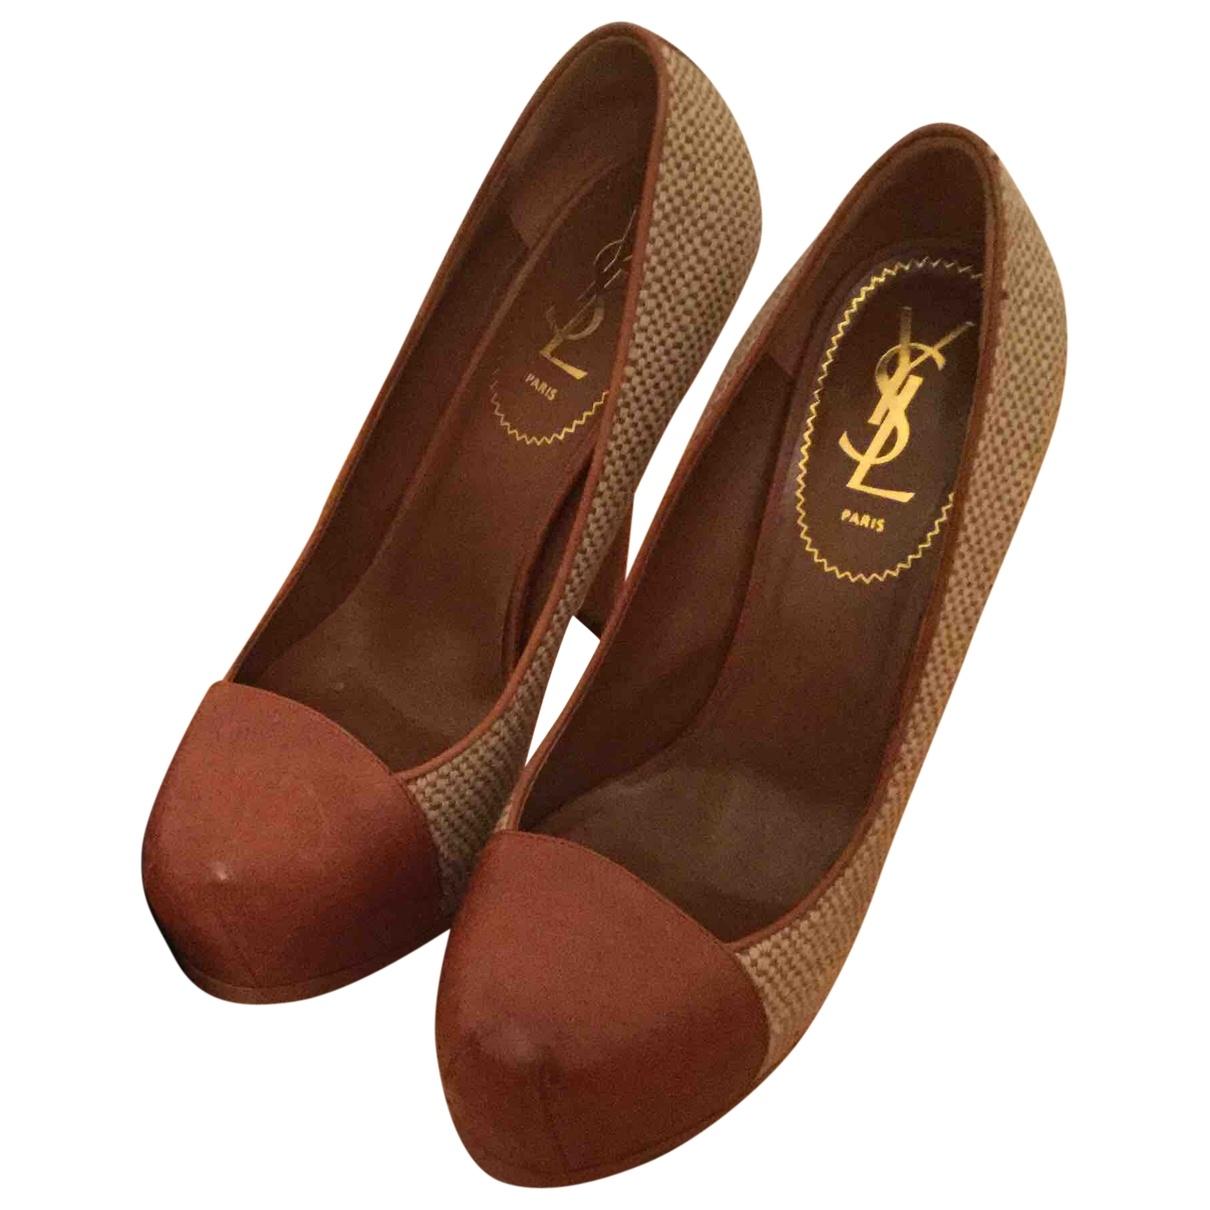 Yves Saint Laurent Trib Too Brown Leather Heels for Women 39 EU